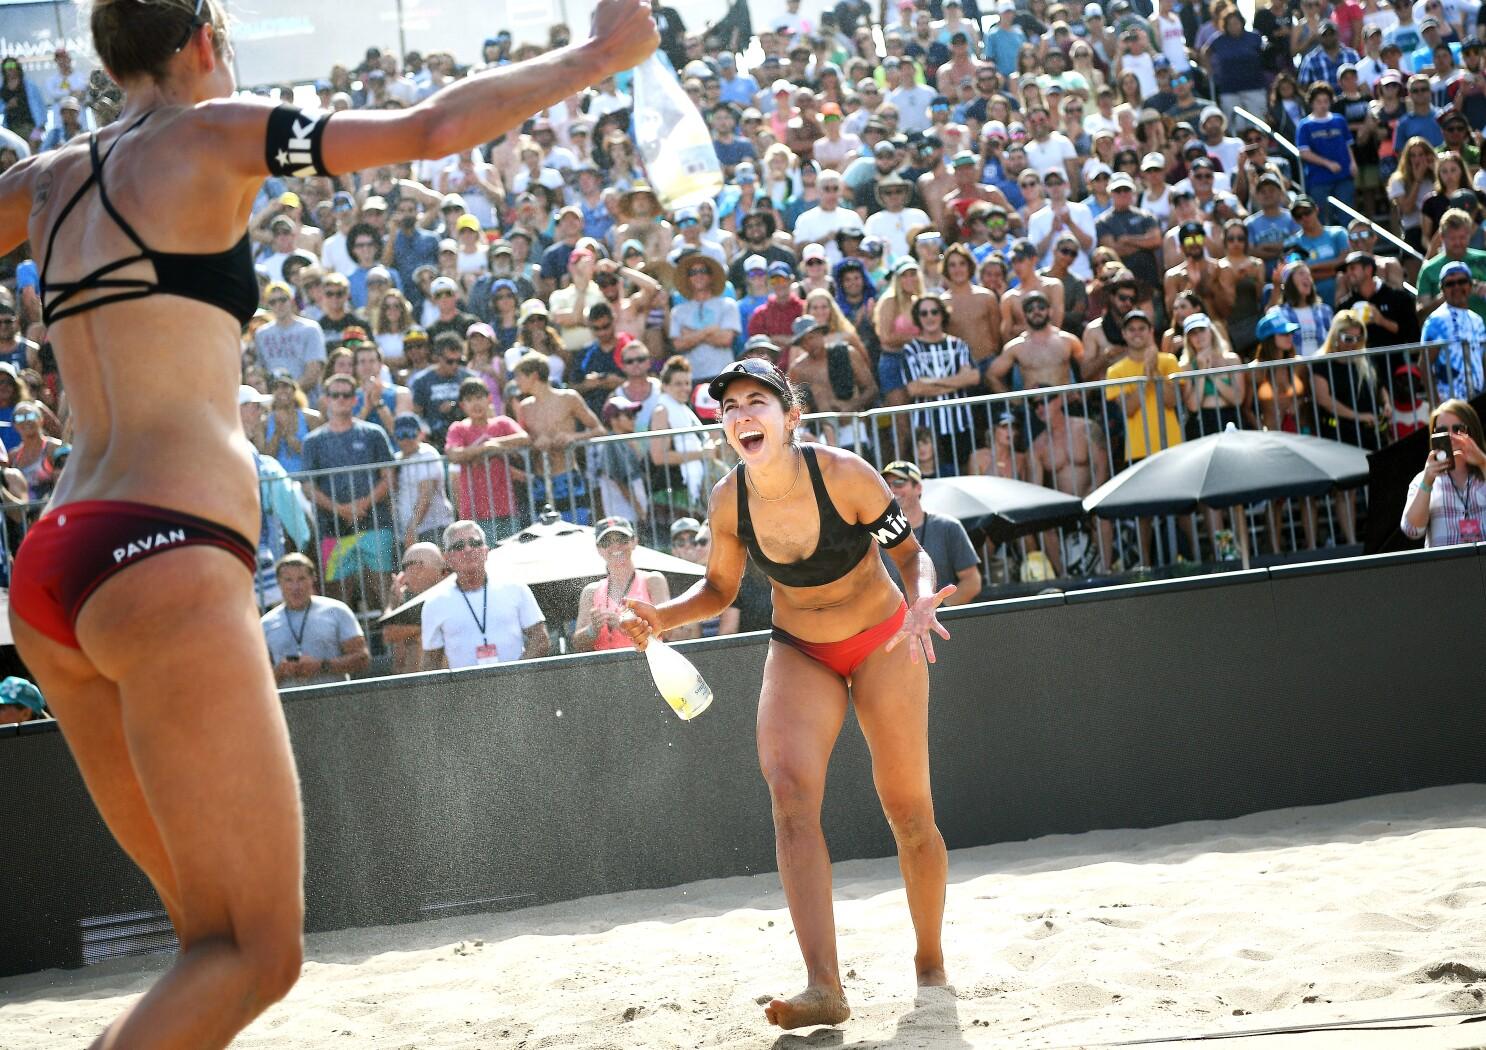 Sarah Pavan and Melissa Humana-Paredes win AVP Manhattan Beach Open